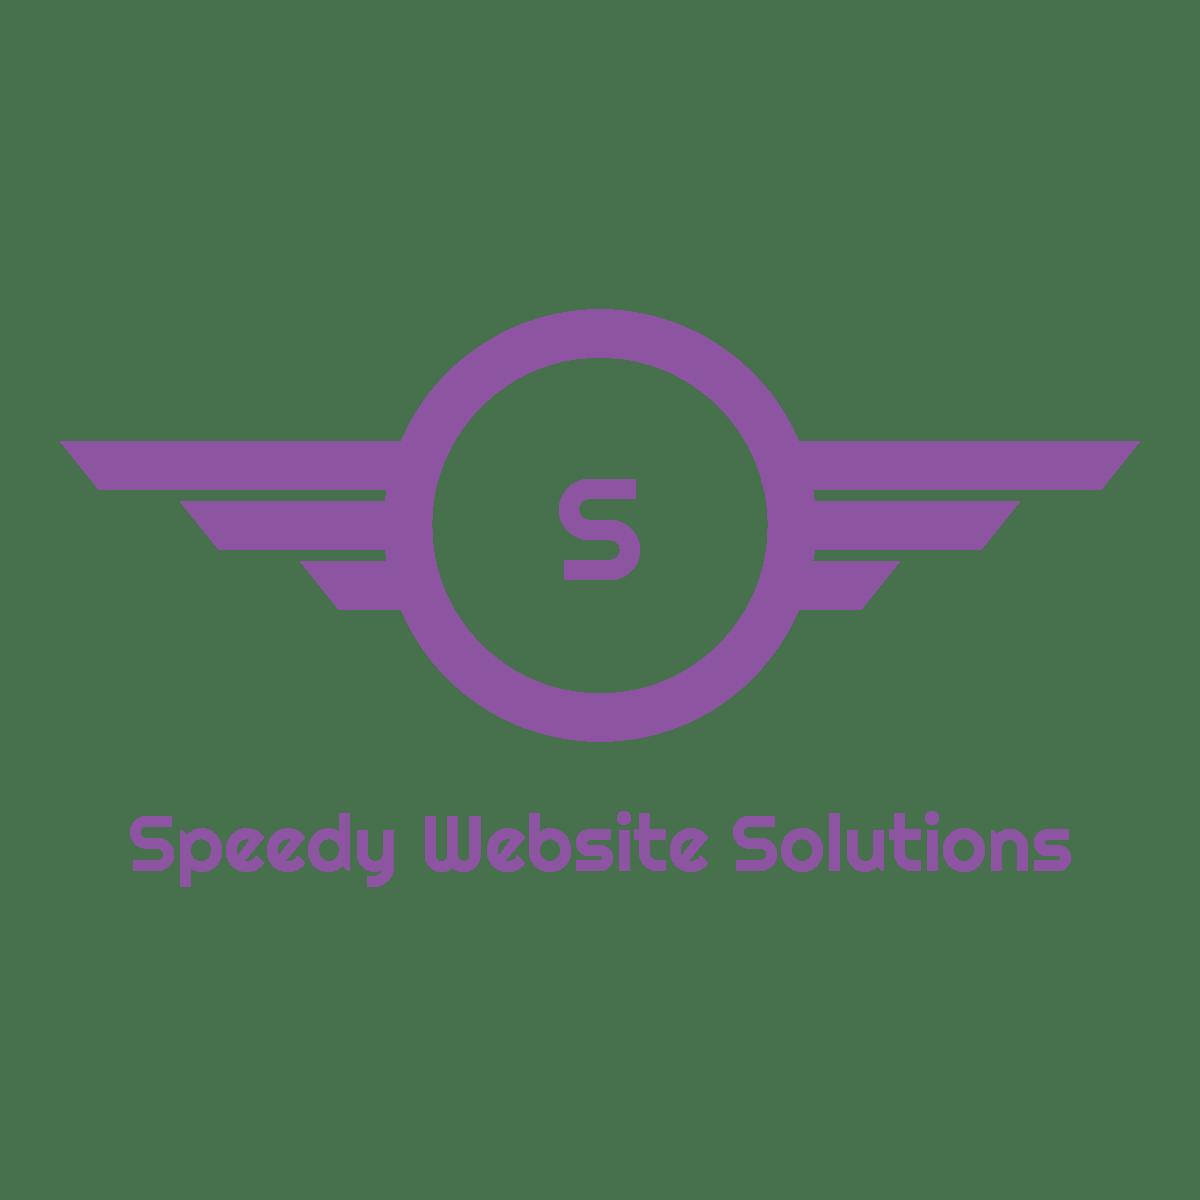 Speedy Website Solutions